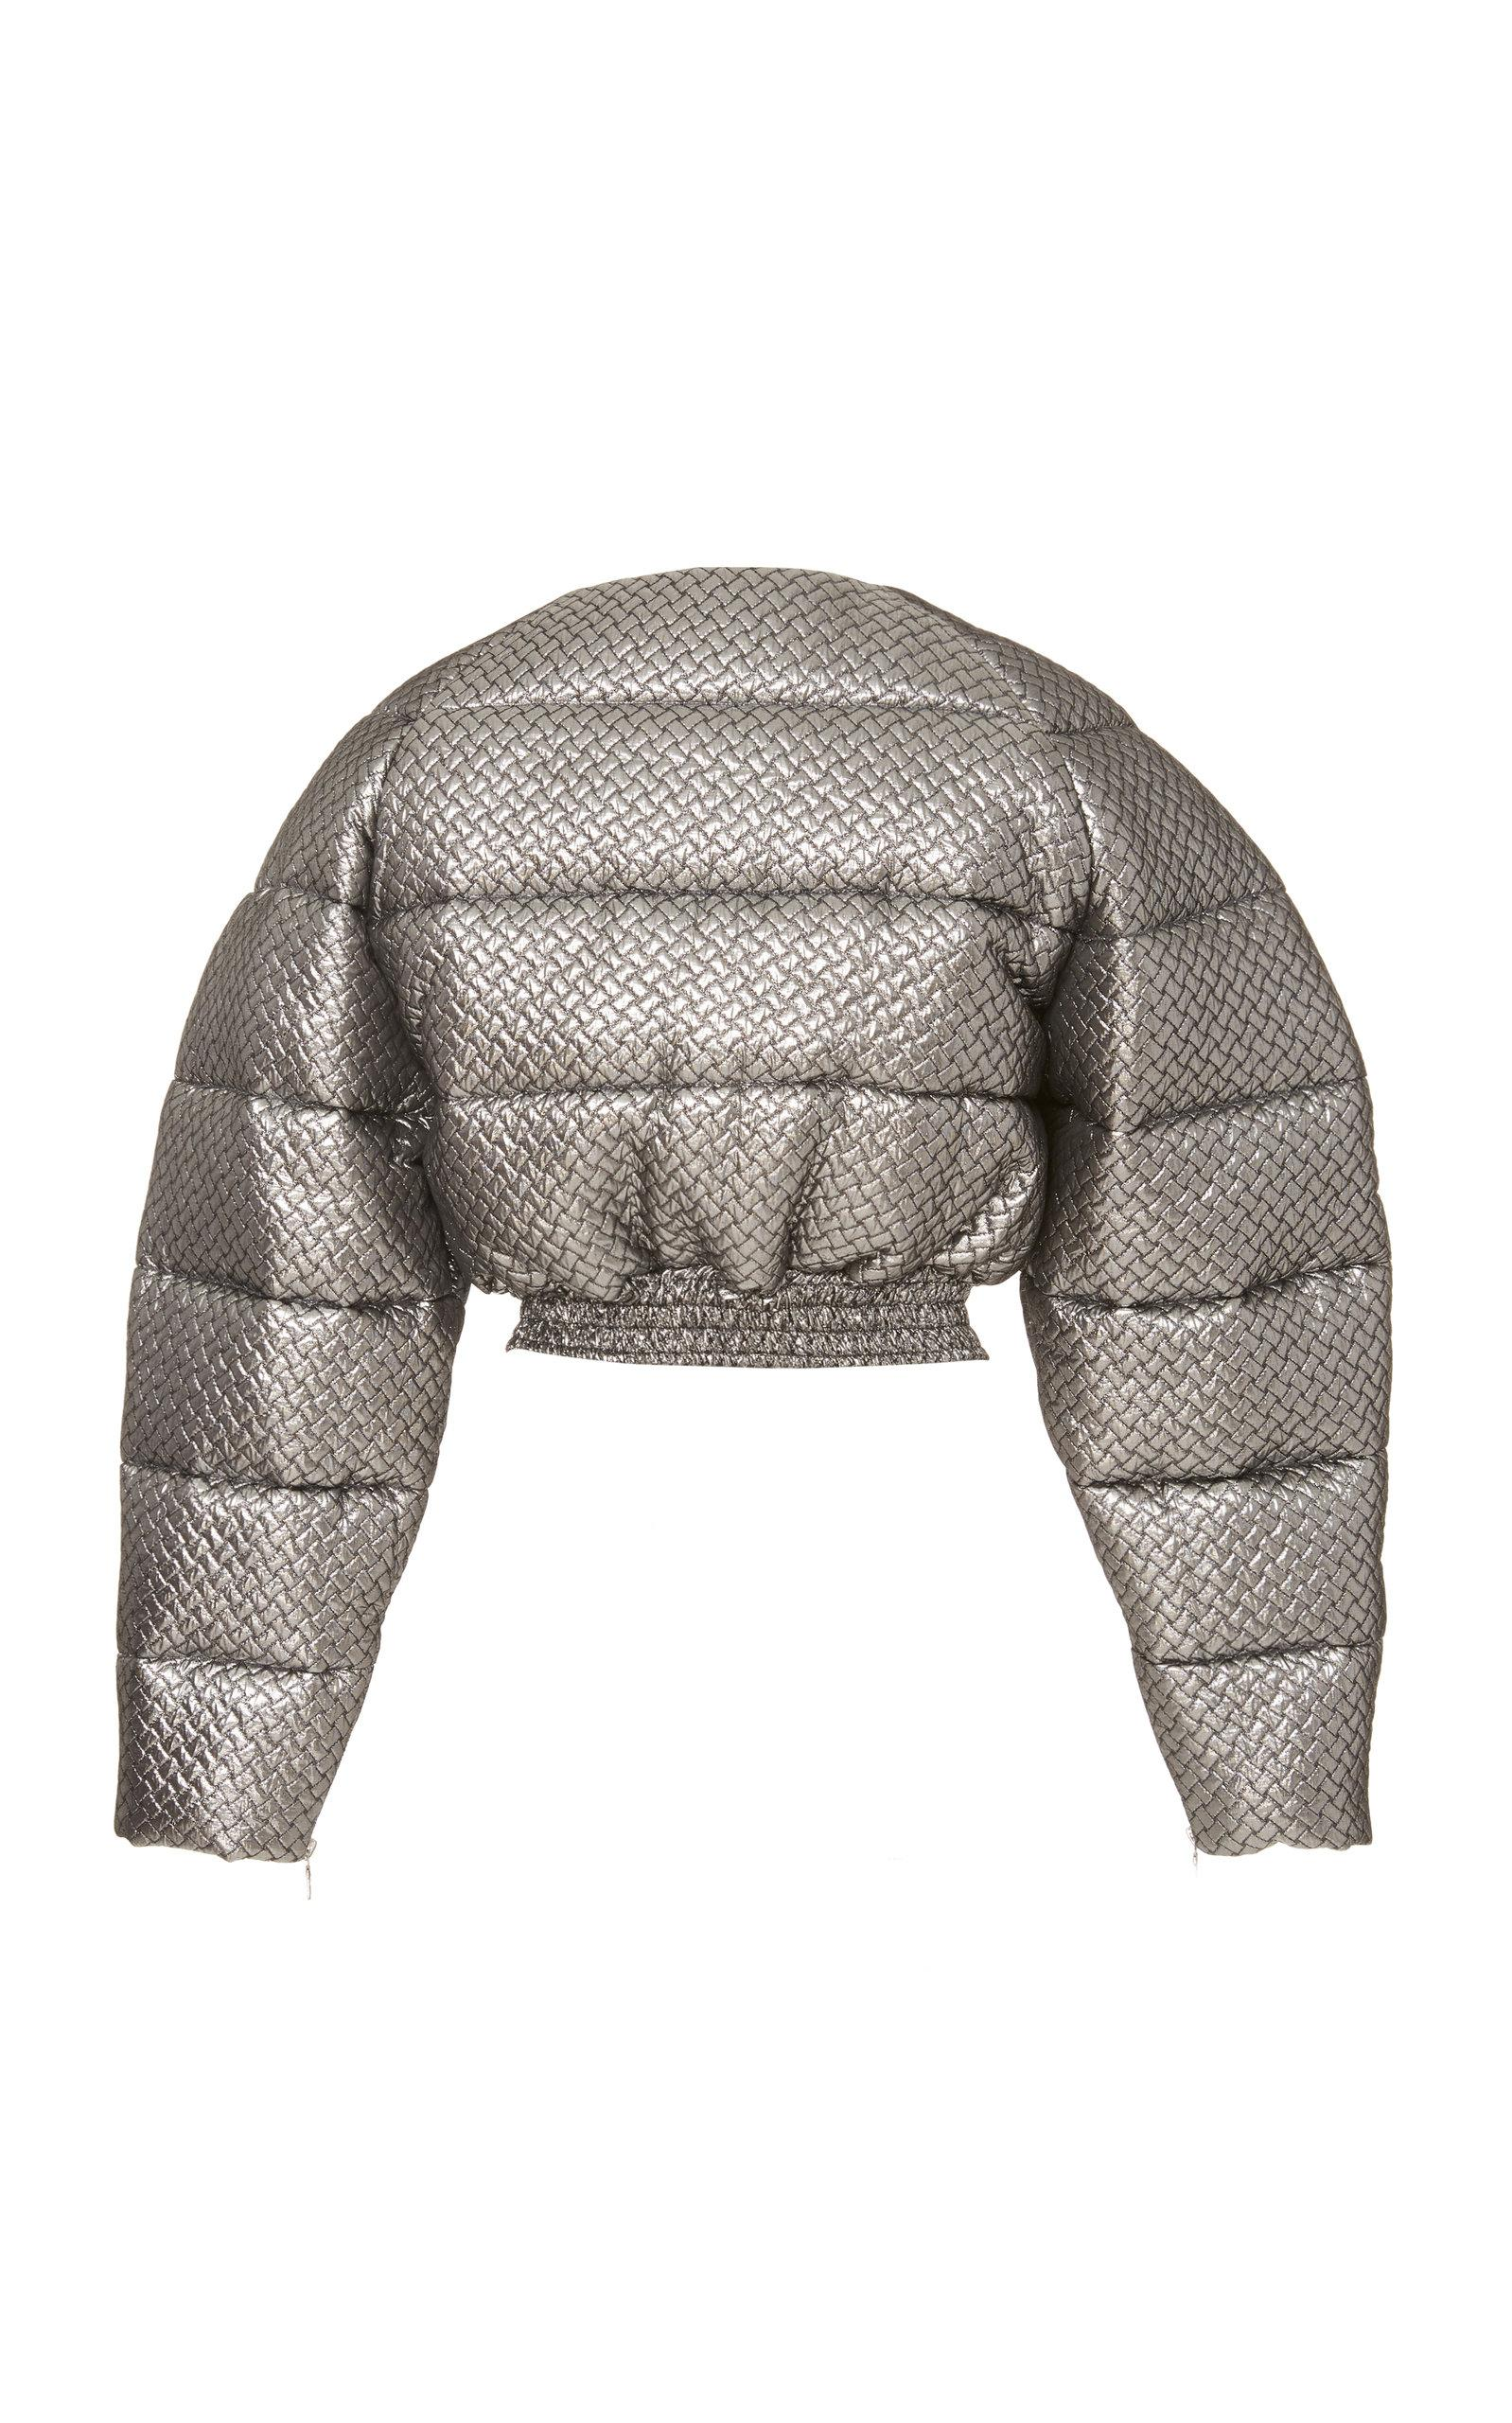 Christian Siriano Denim Cropped Matelasse Puffer Jacket in ...